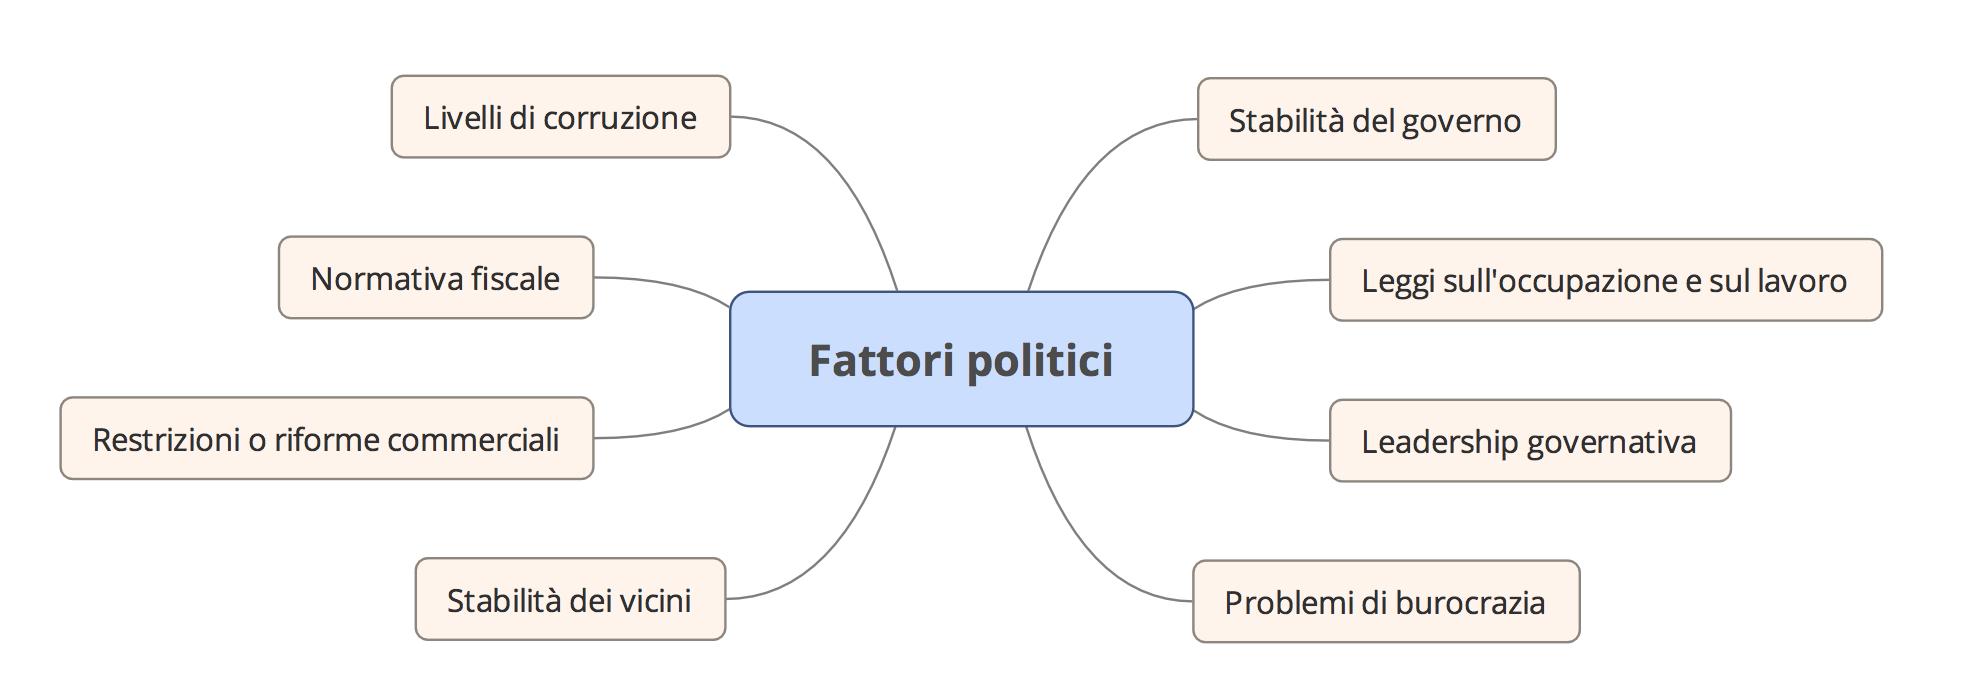 Analisi PEST fattori politici